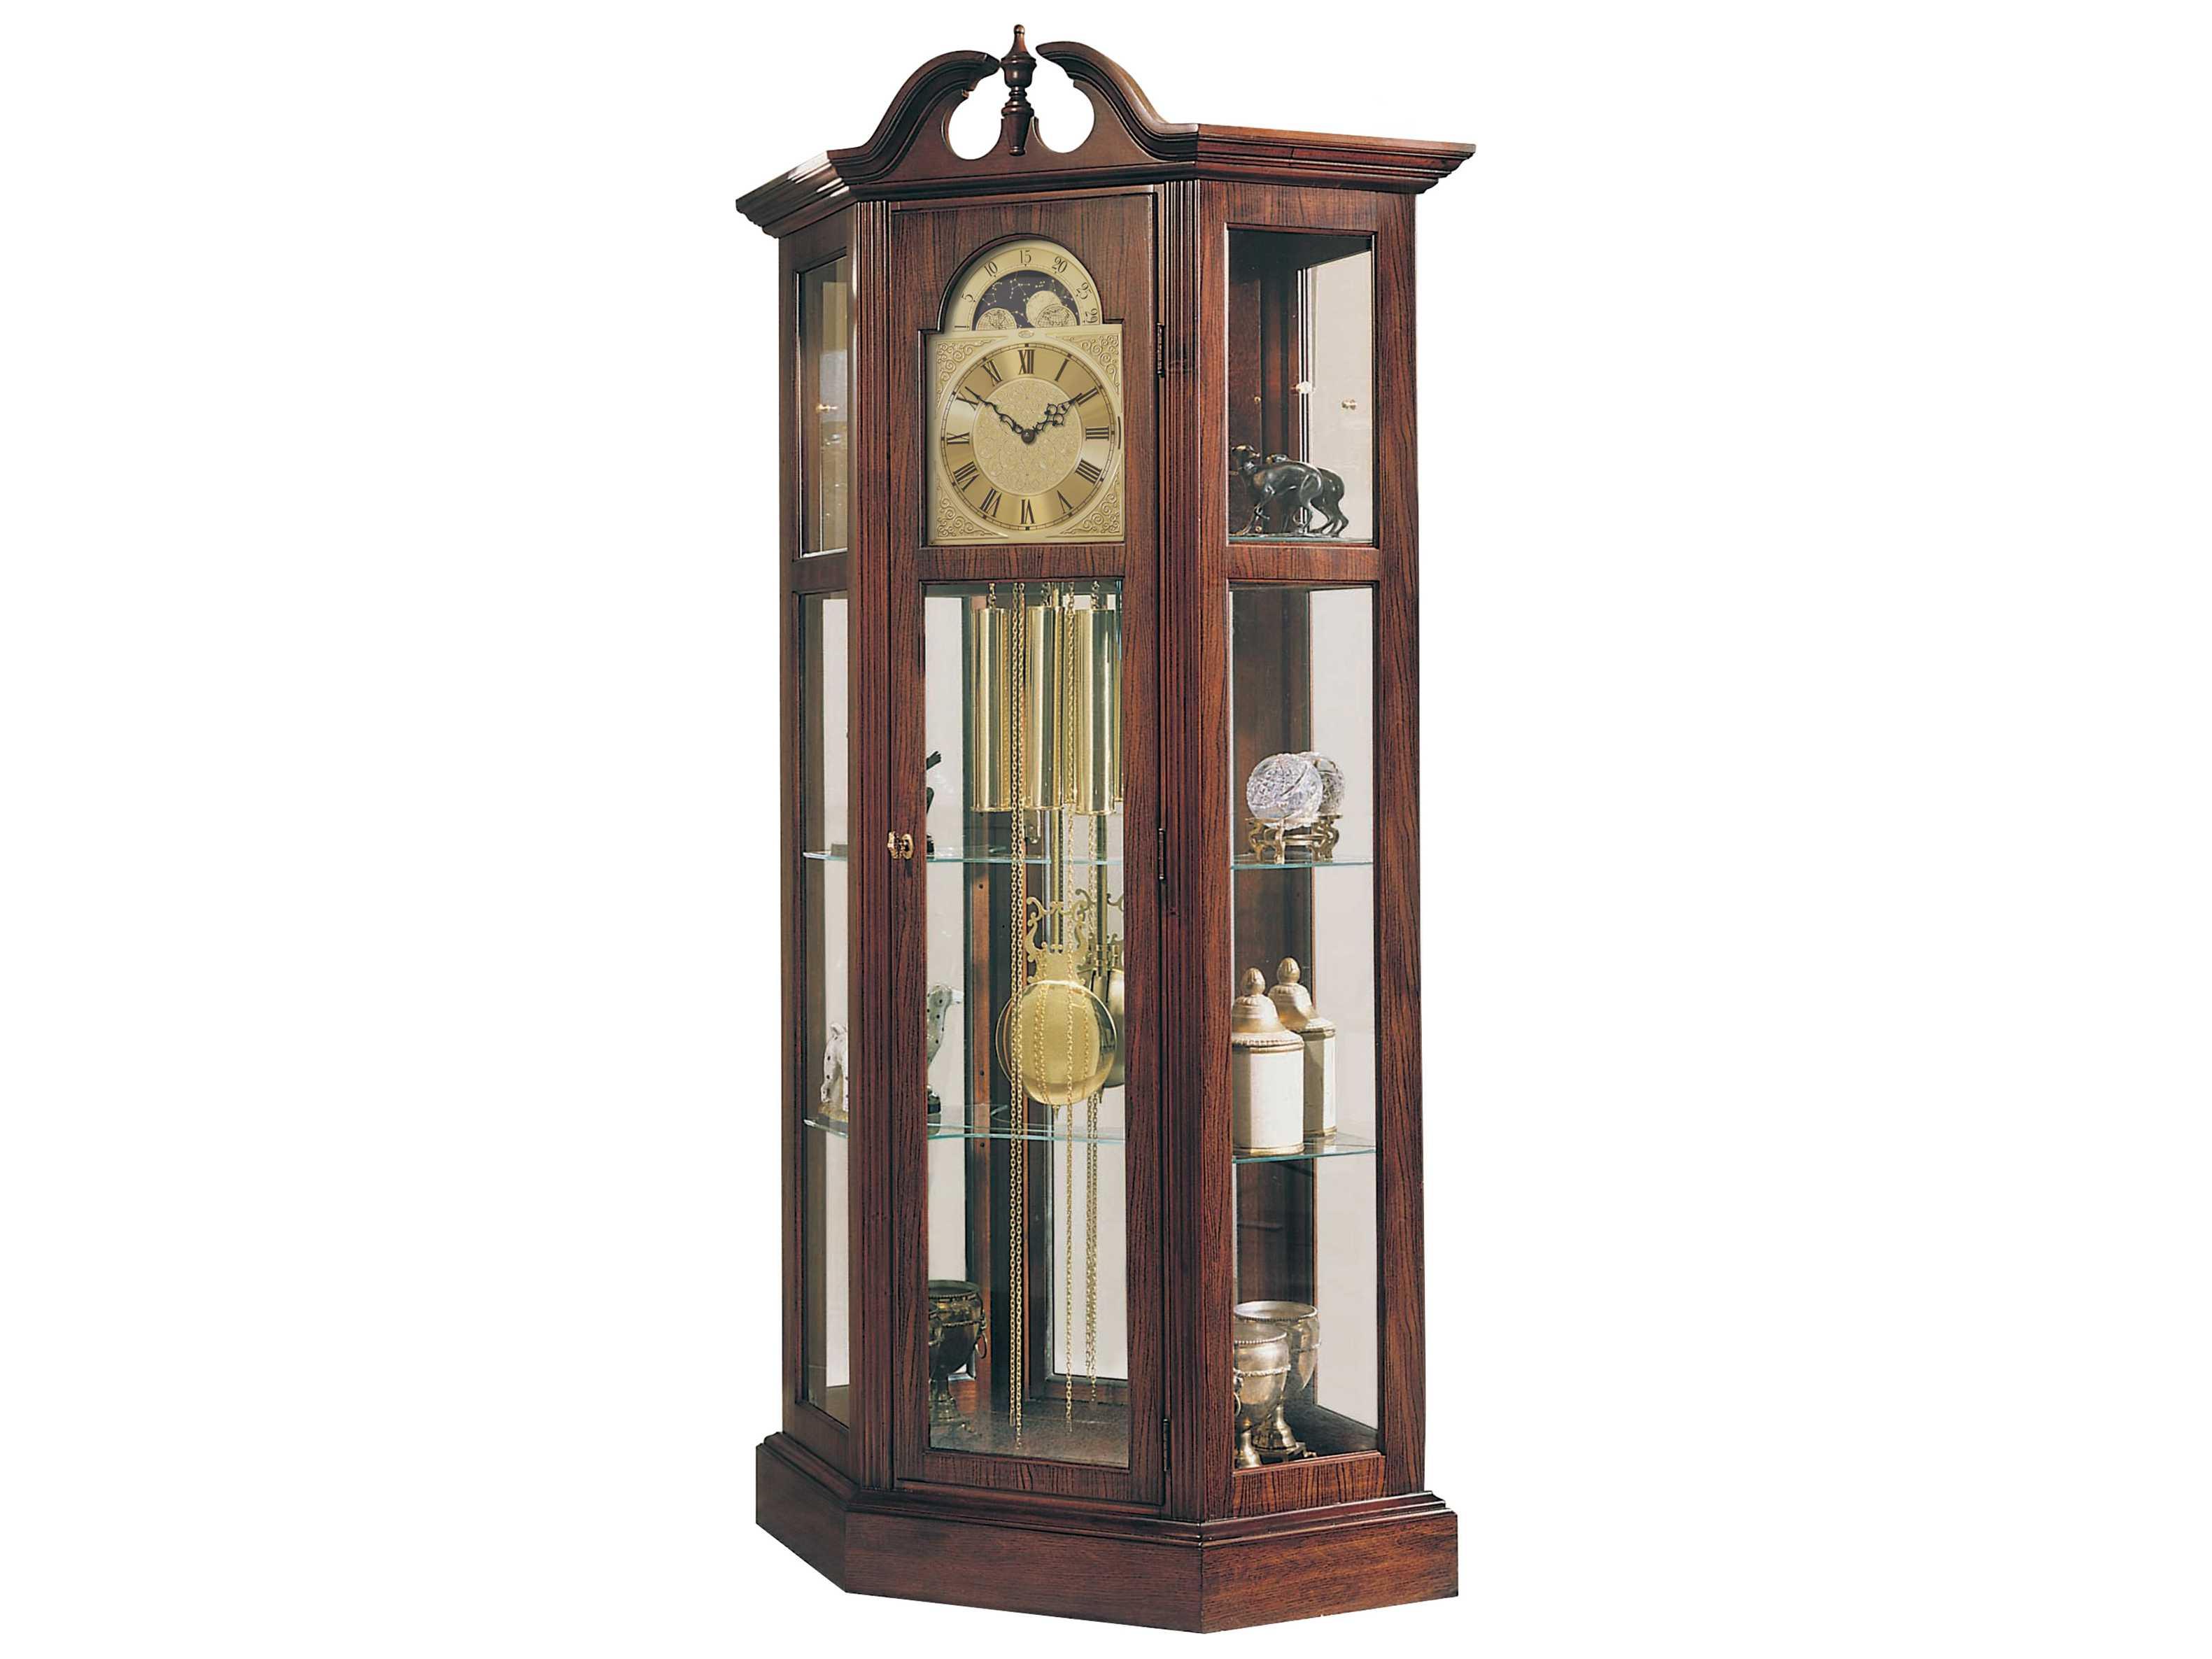 Ridgeway Clocks Richardson I Antique Cherry Curio Grandfather Clock